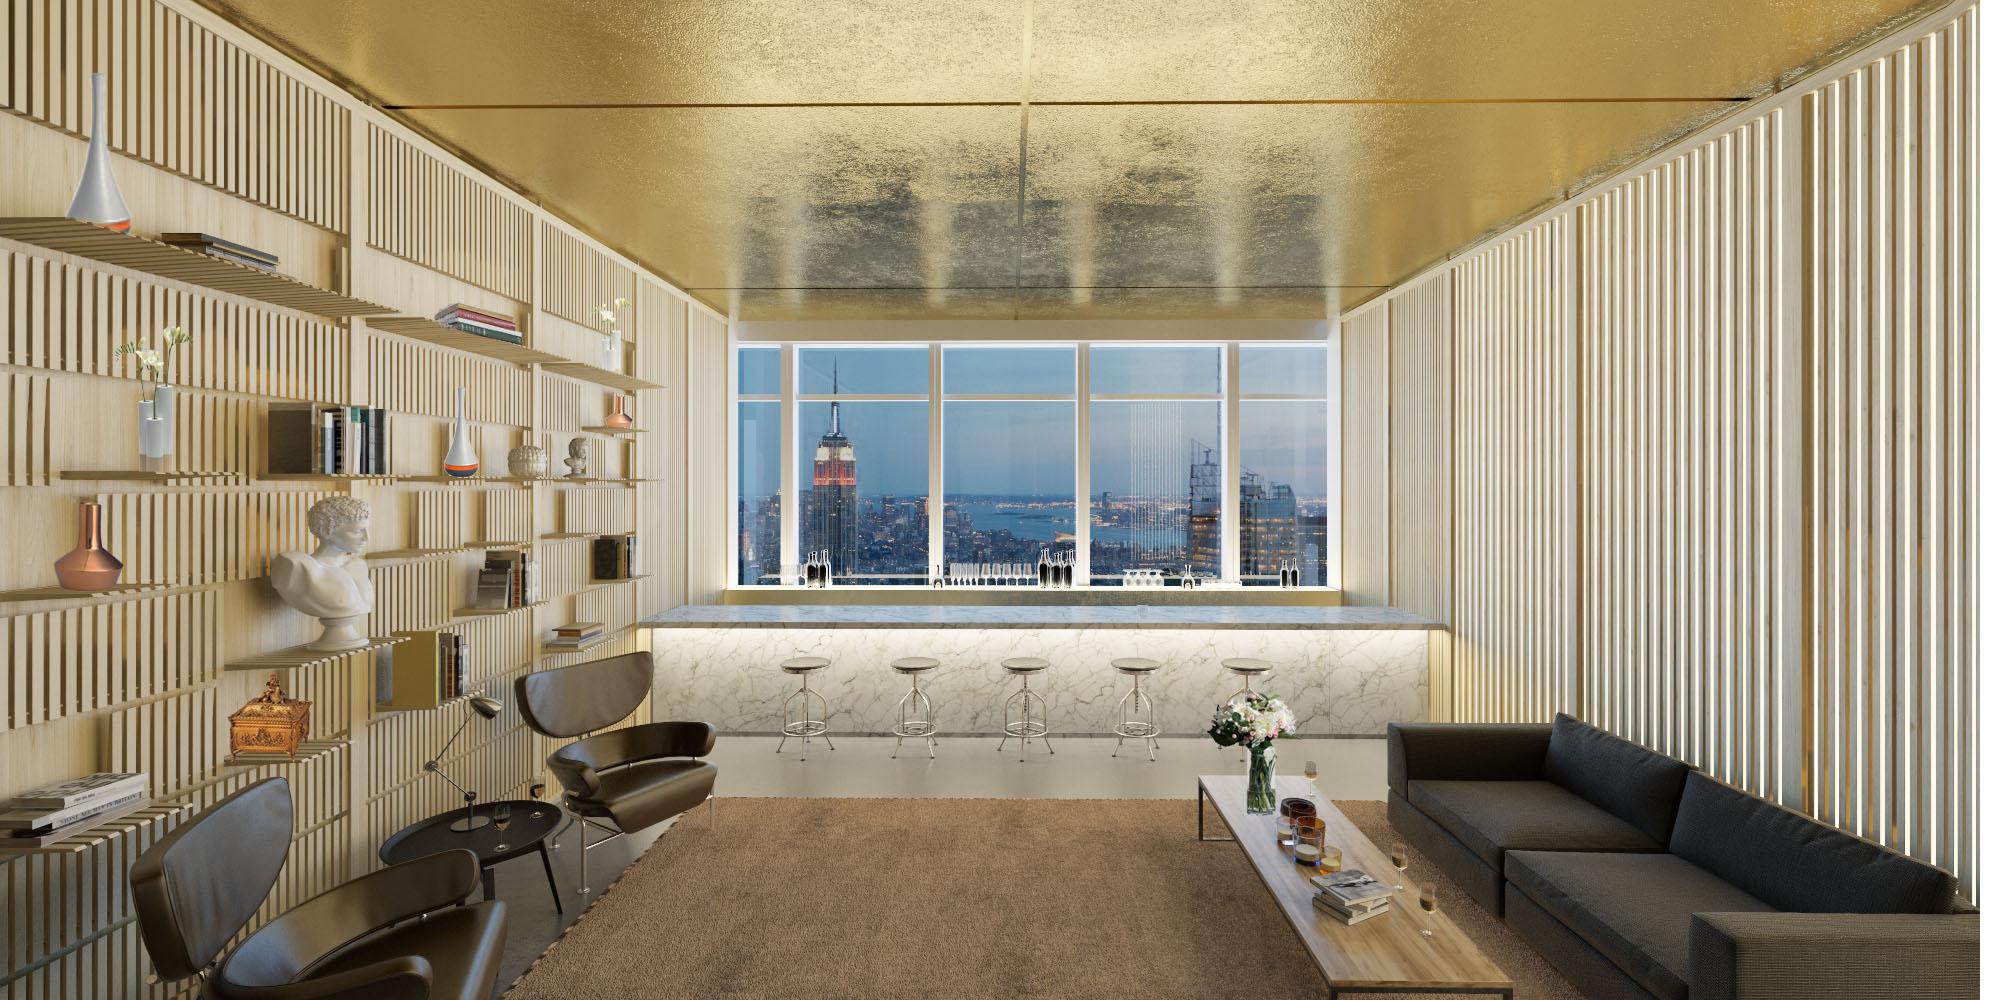 5 La Maison by Sebastian Errazuriz.jpg